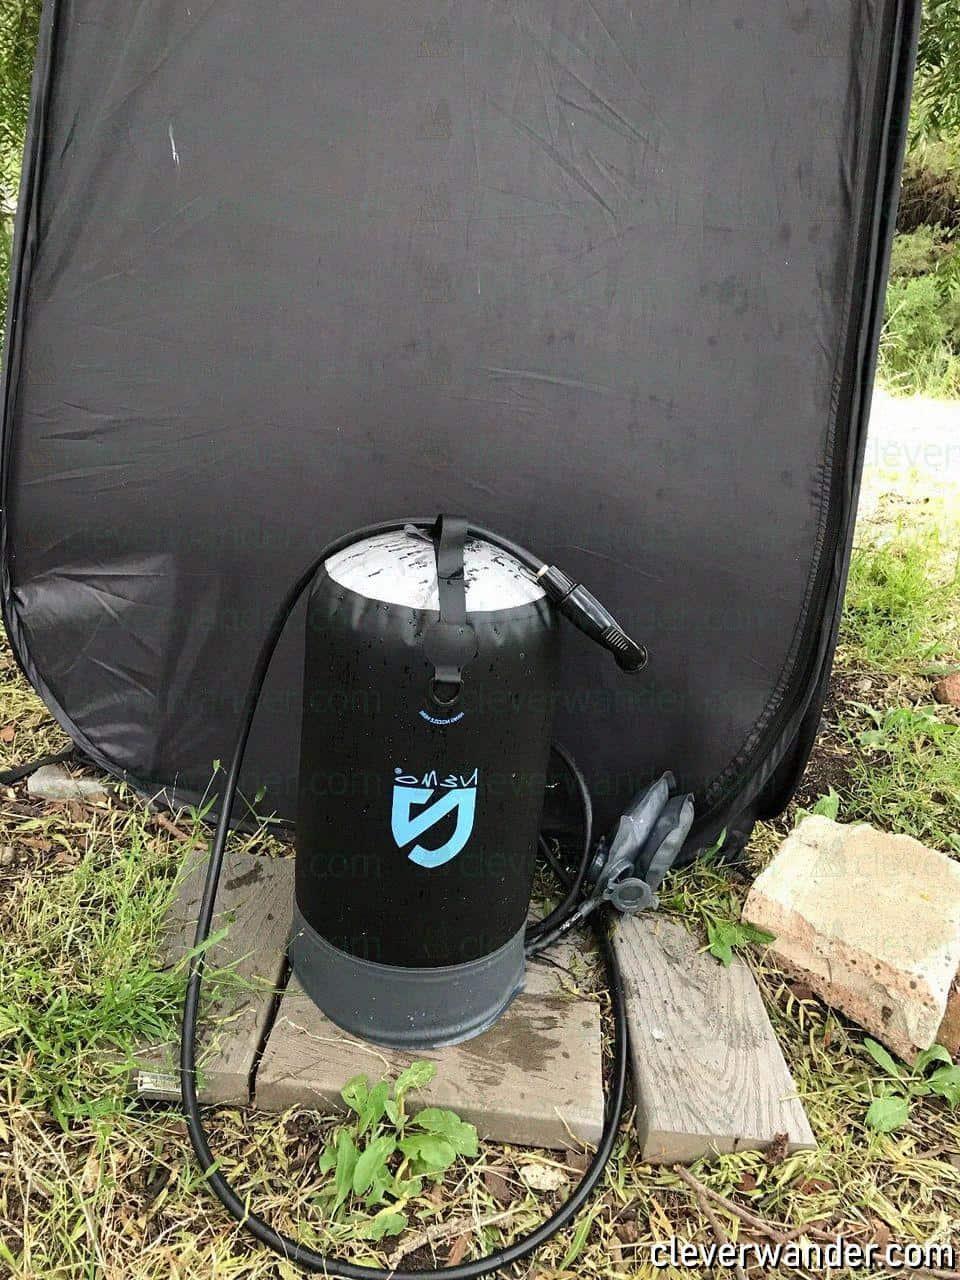 Nemo Helio Portable Pressure Shower - image review 1